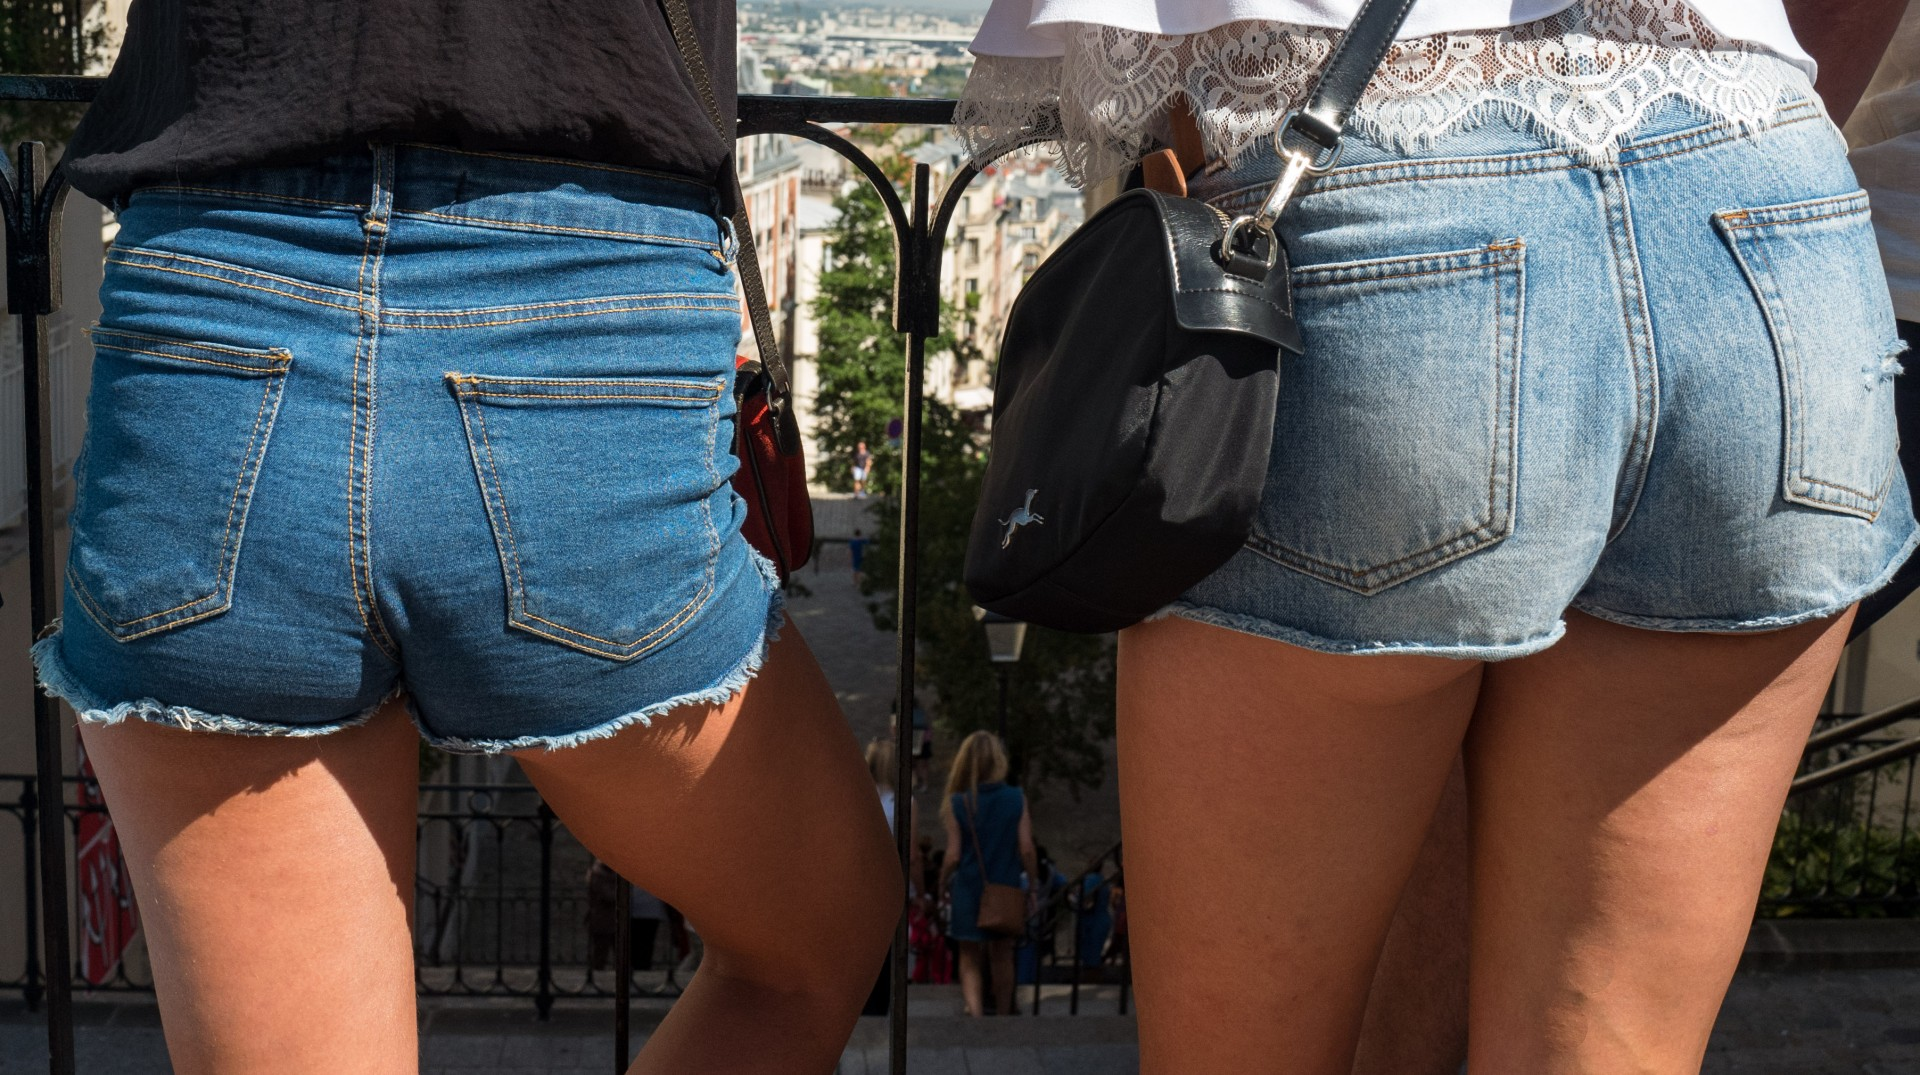 summertime in paris with leica q